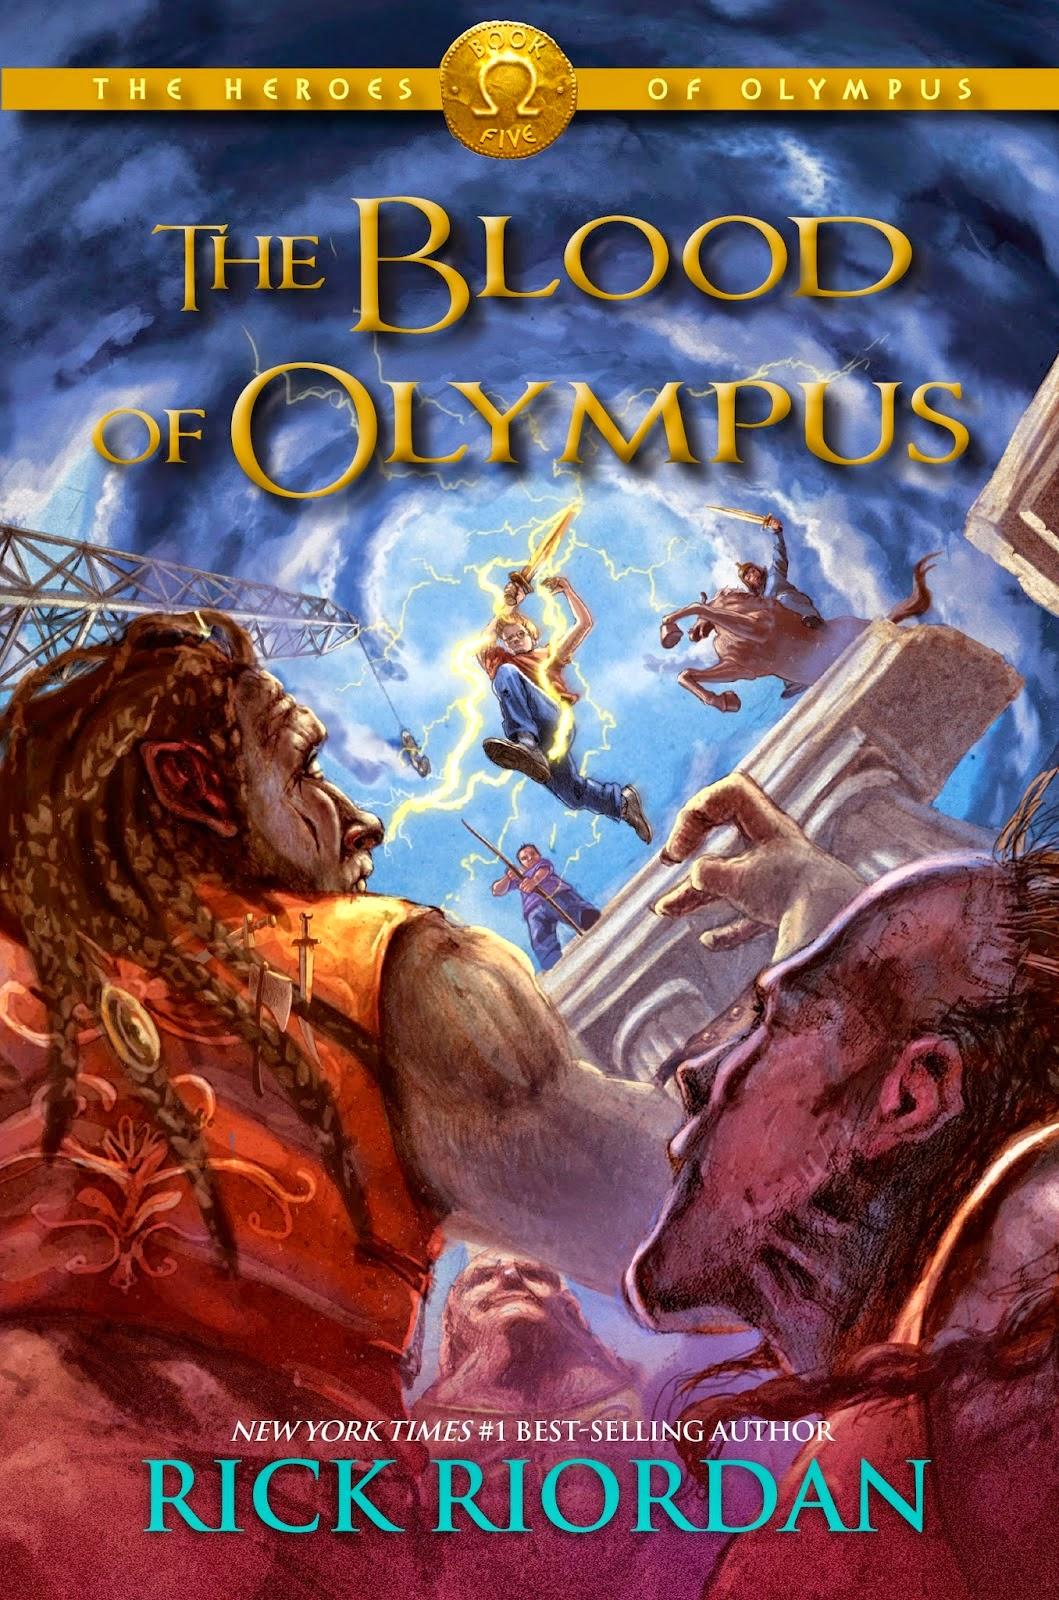 Portada estadounidense de The Blood of Olympus